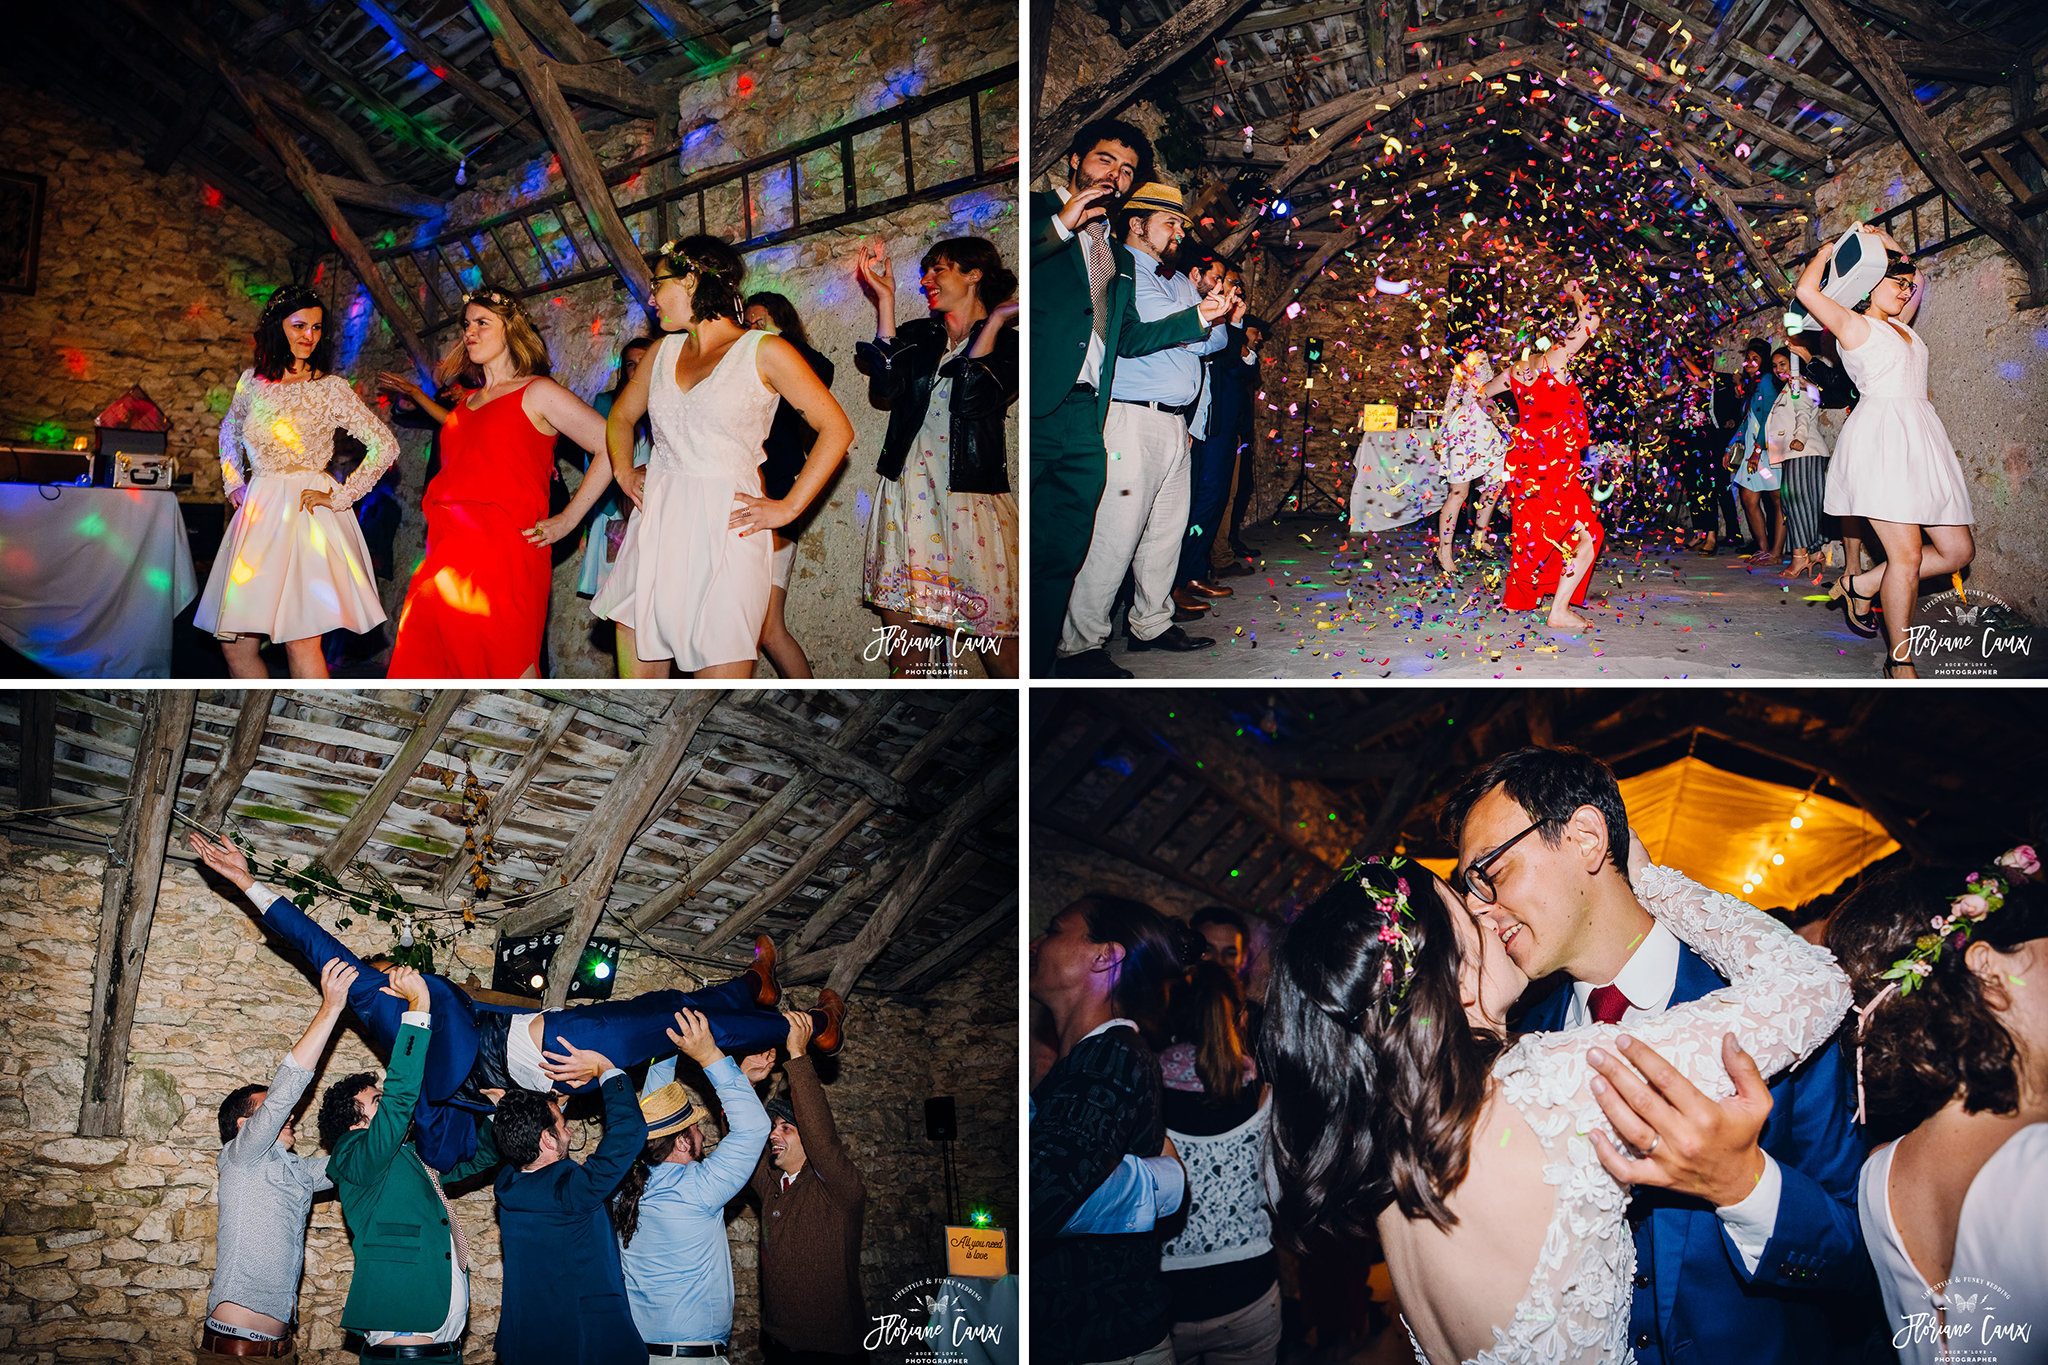 my-dear-festival-party-mariage-chez-soi-15